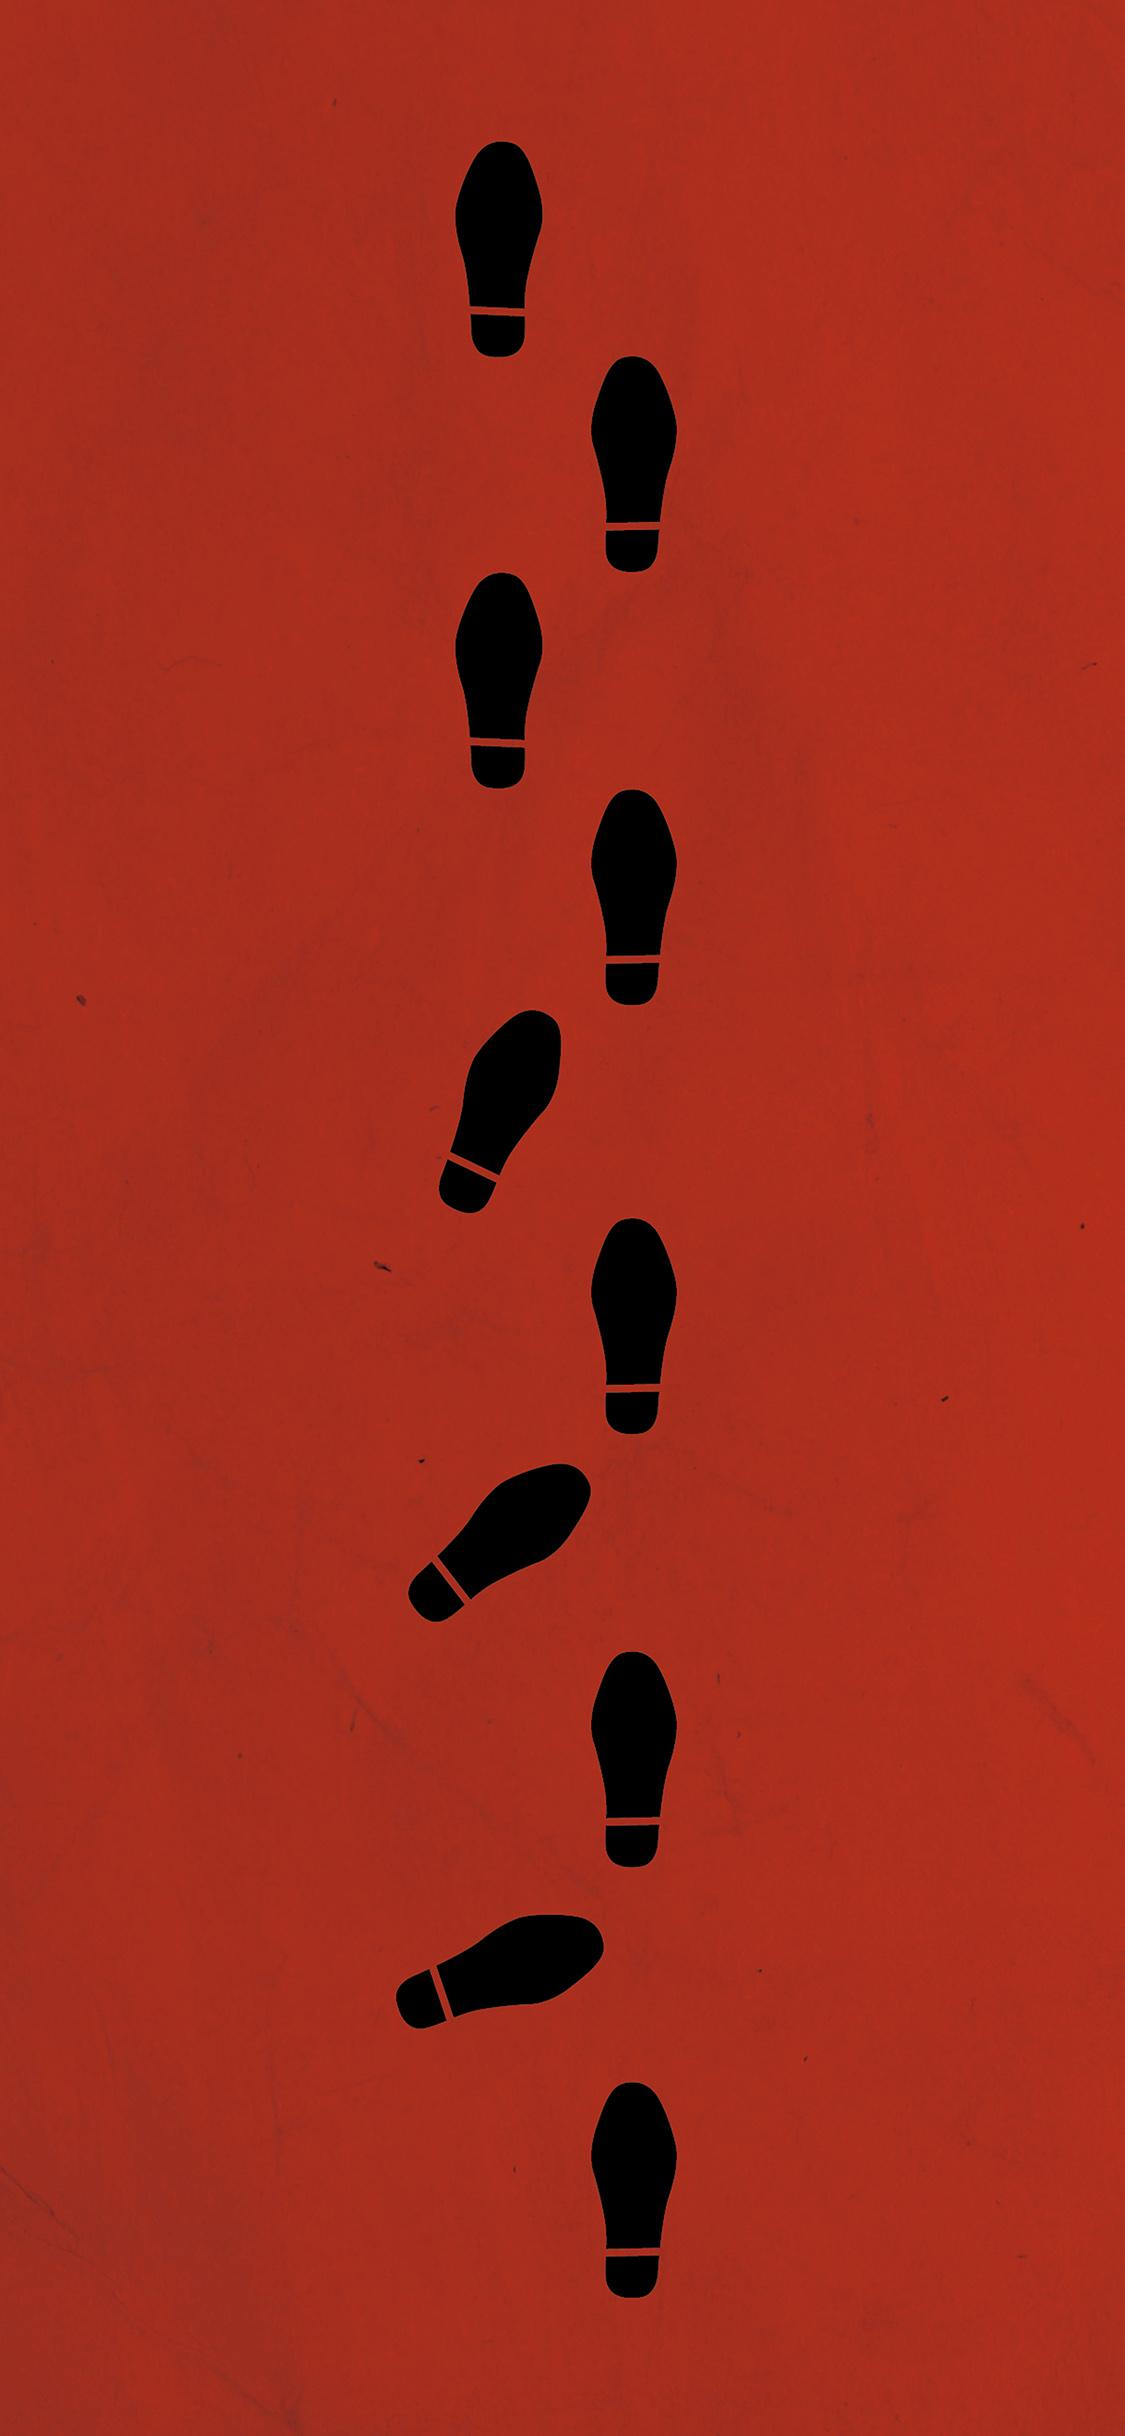 Ao25 minimal usual suspects film poster art illust for Minimal art essay